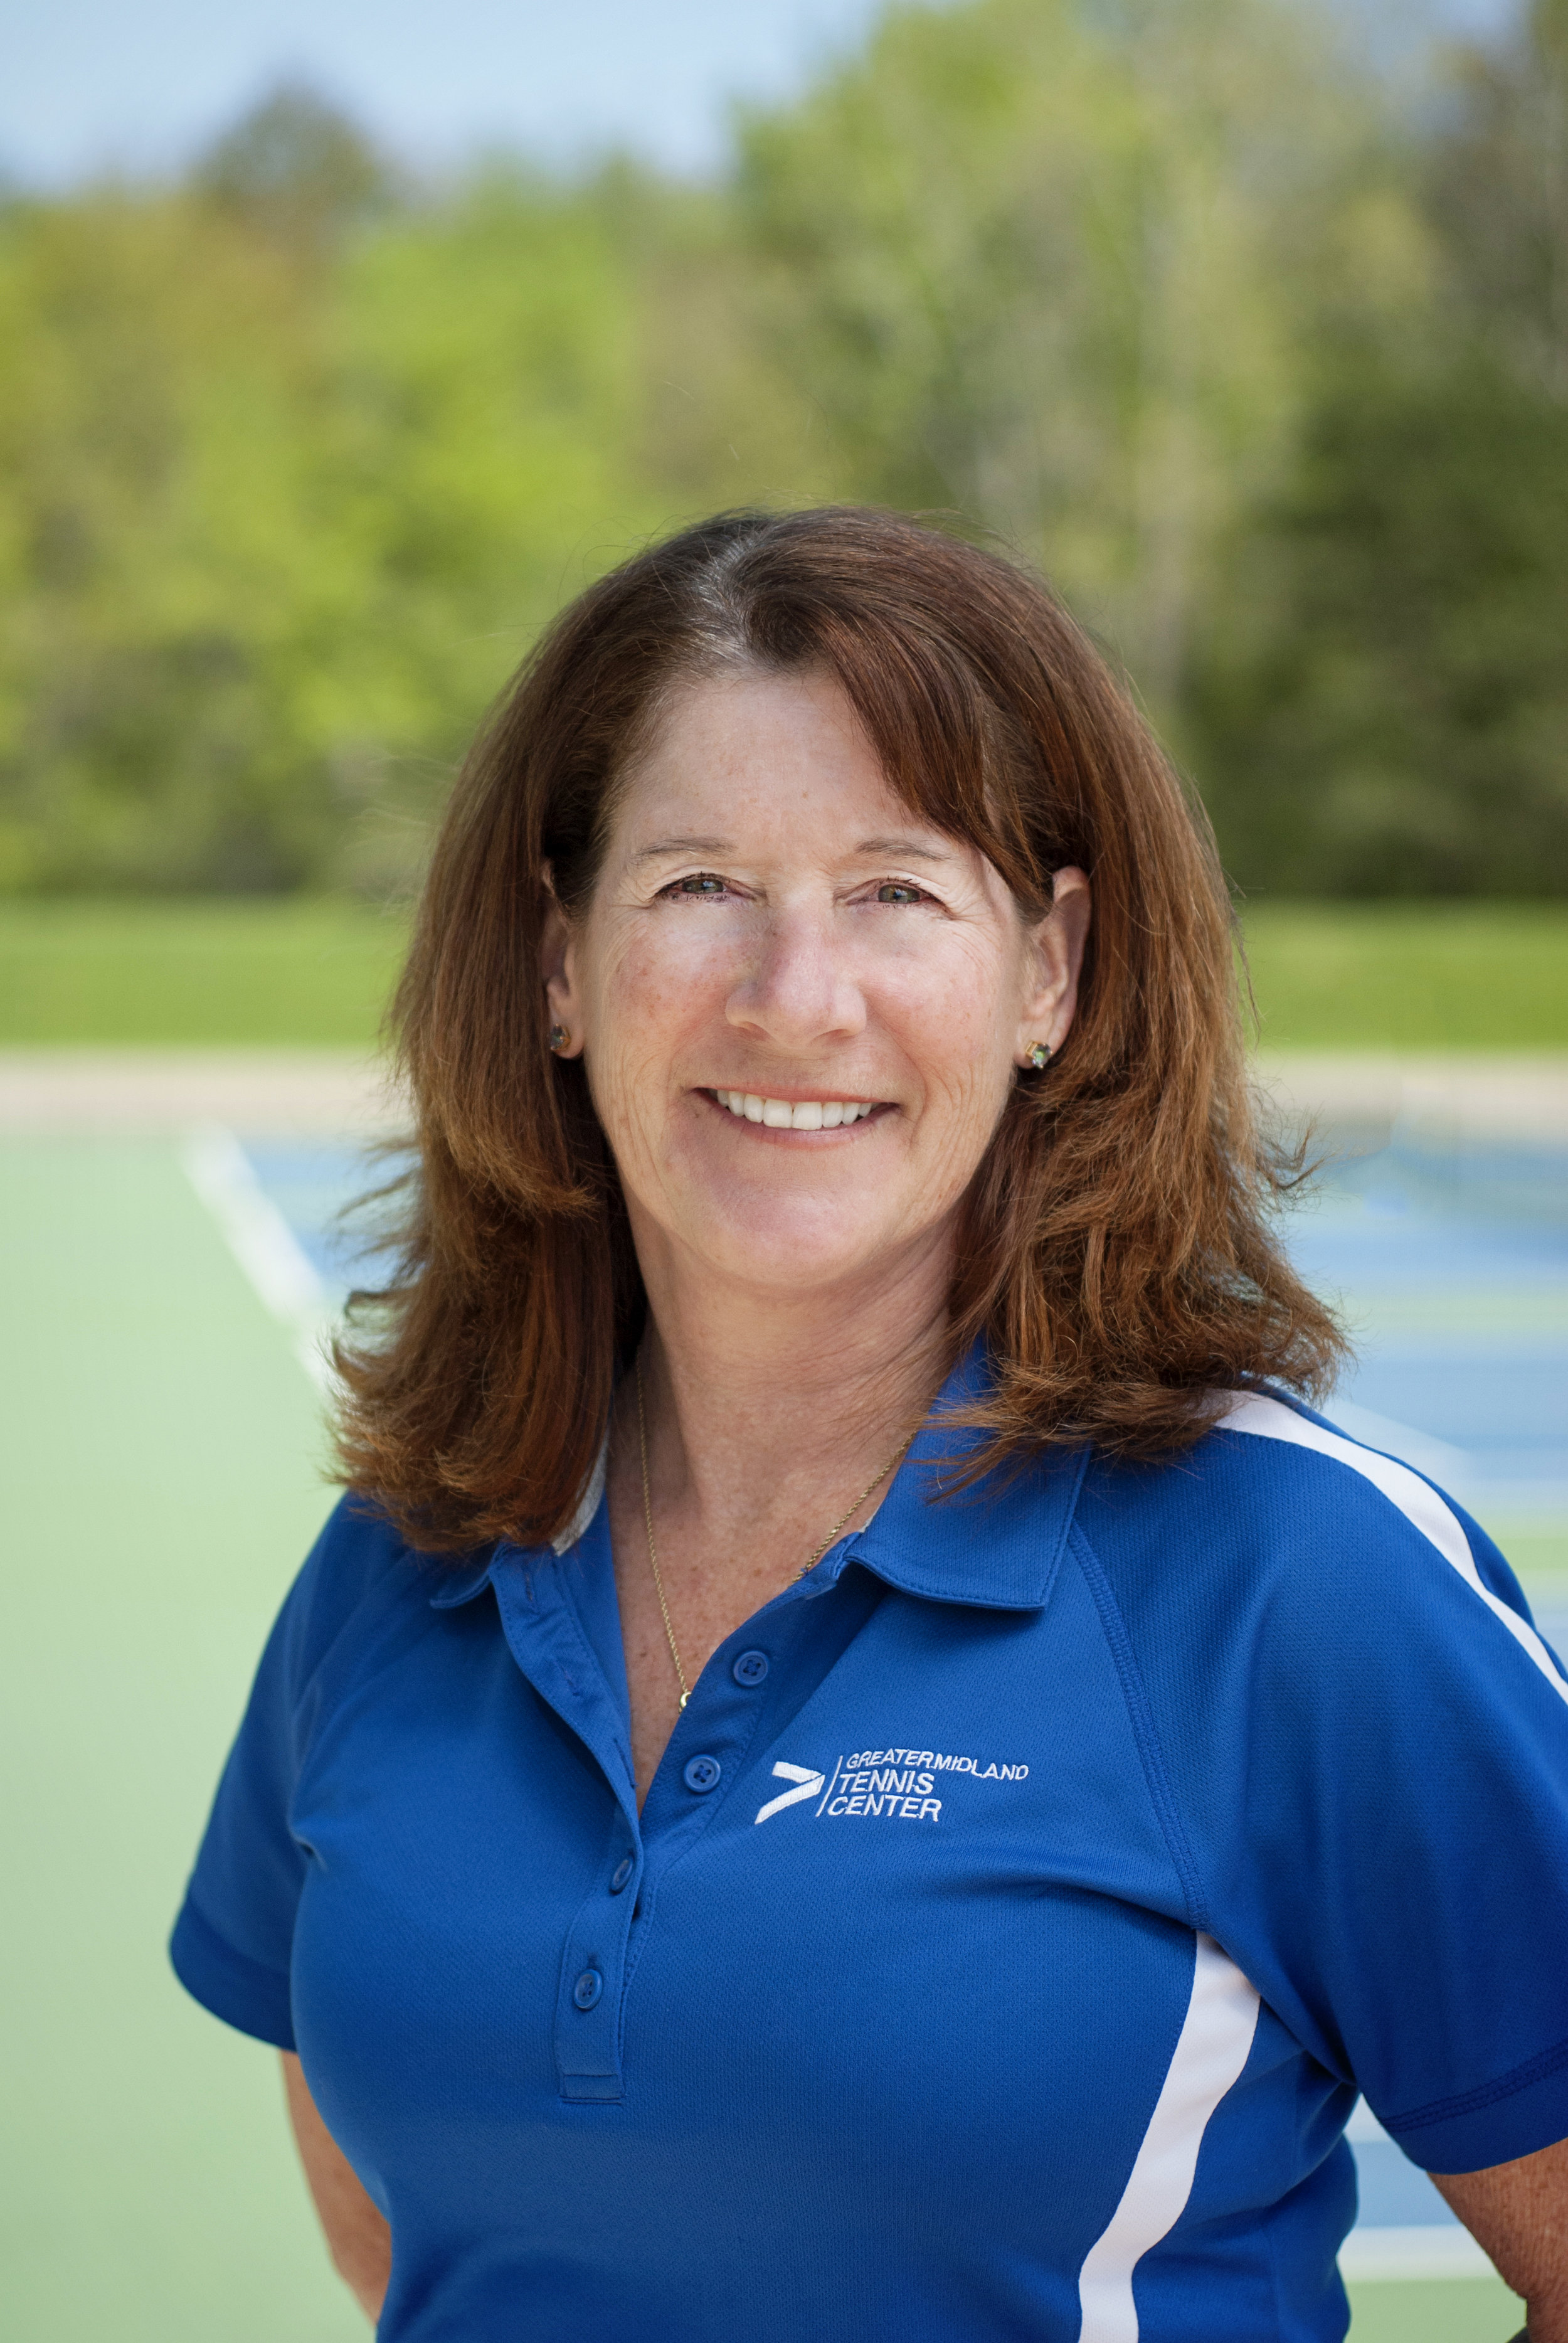 Sally Wasserman Assistant Director of TennisWhizz